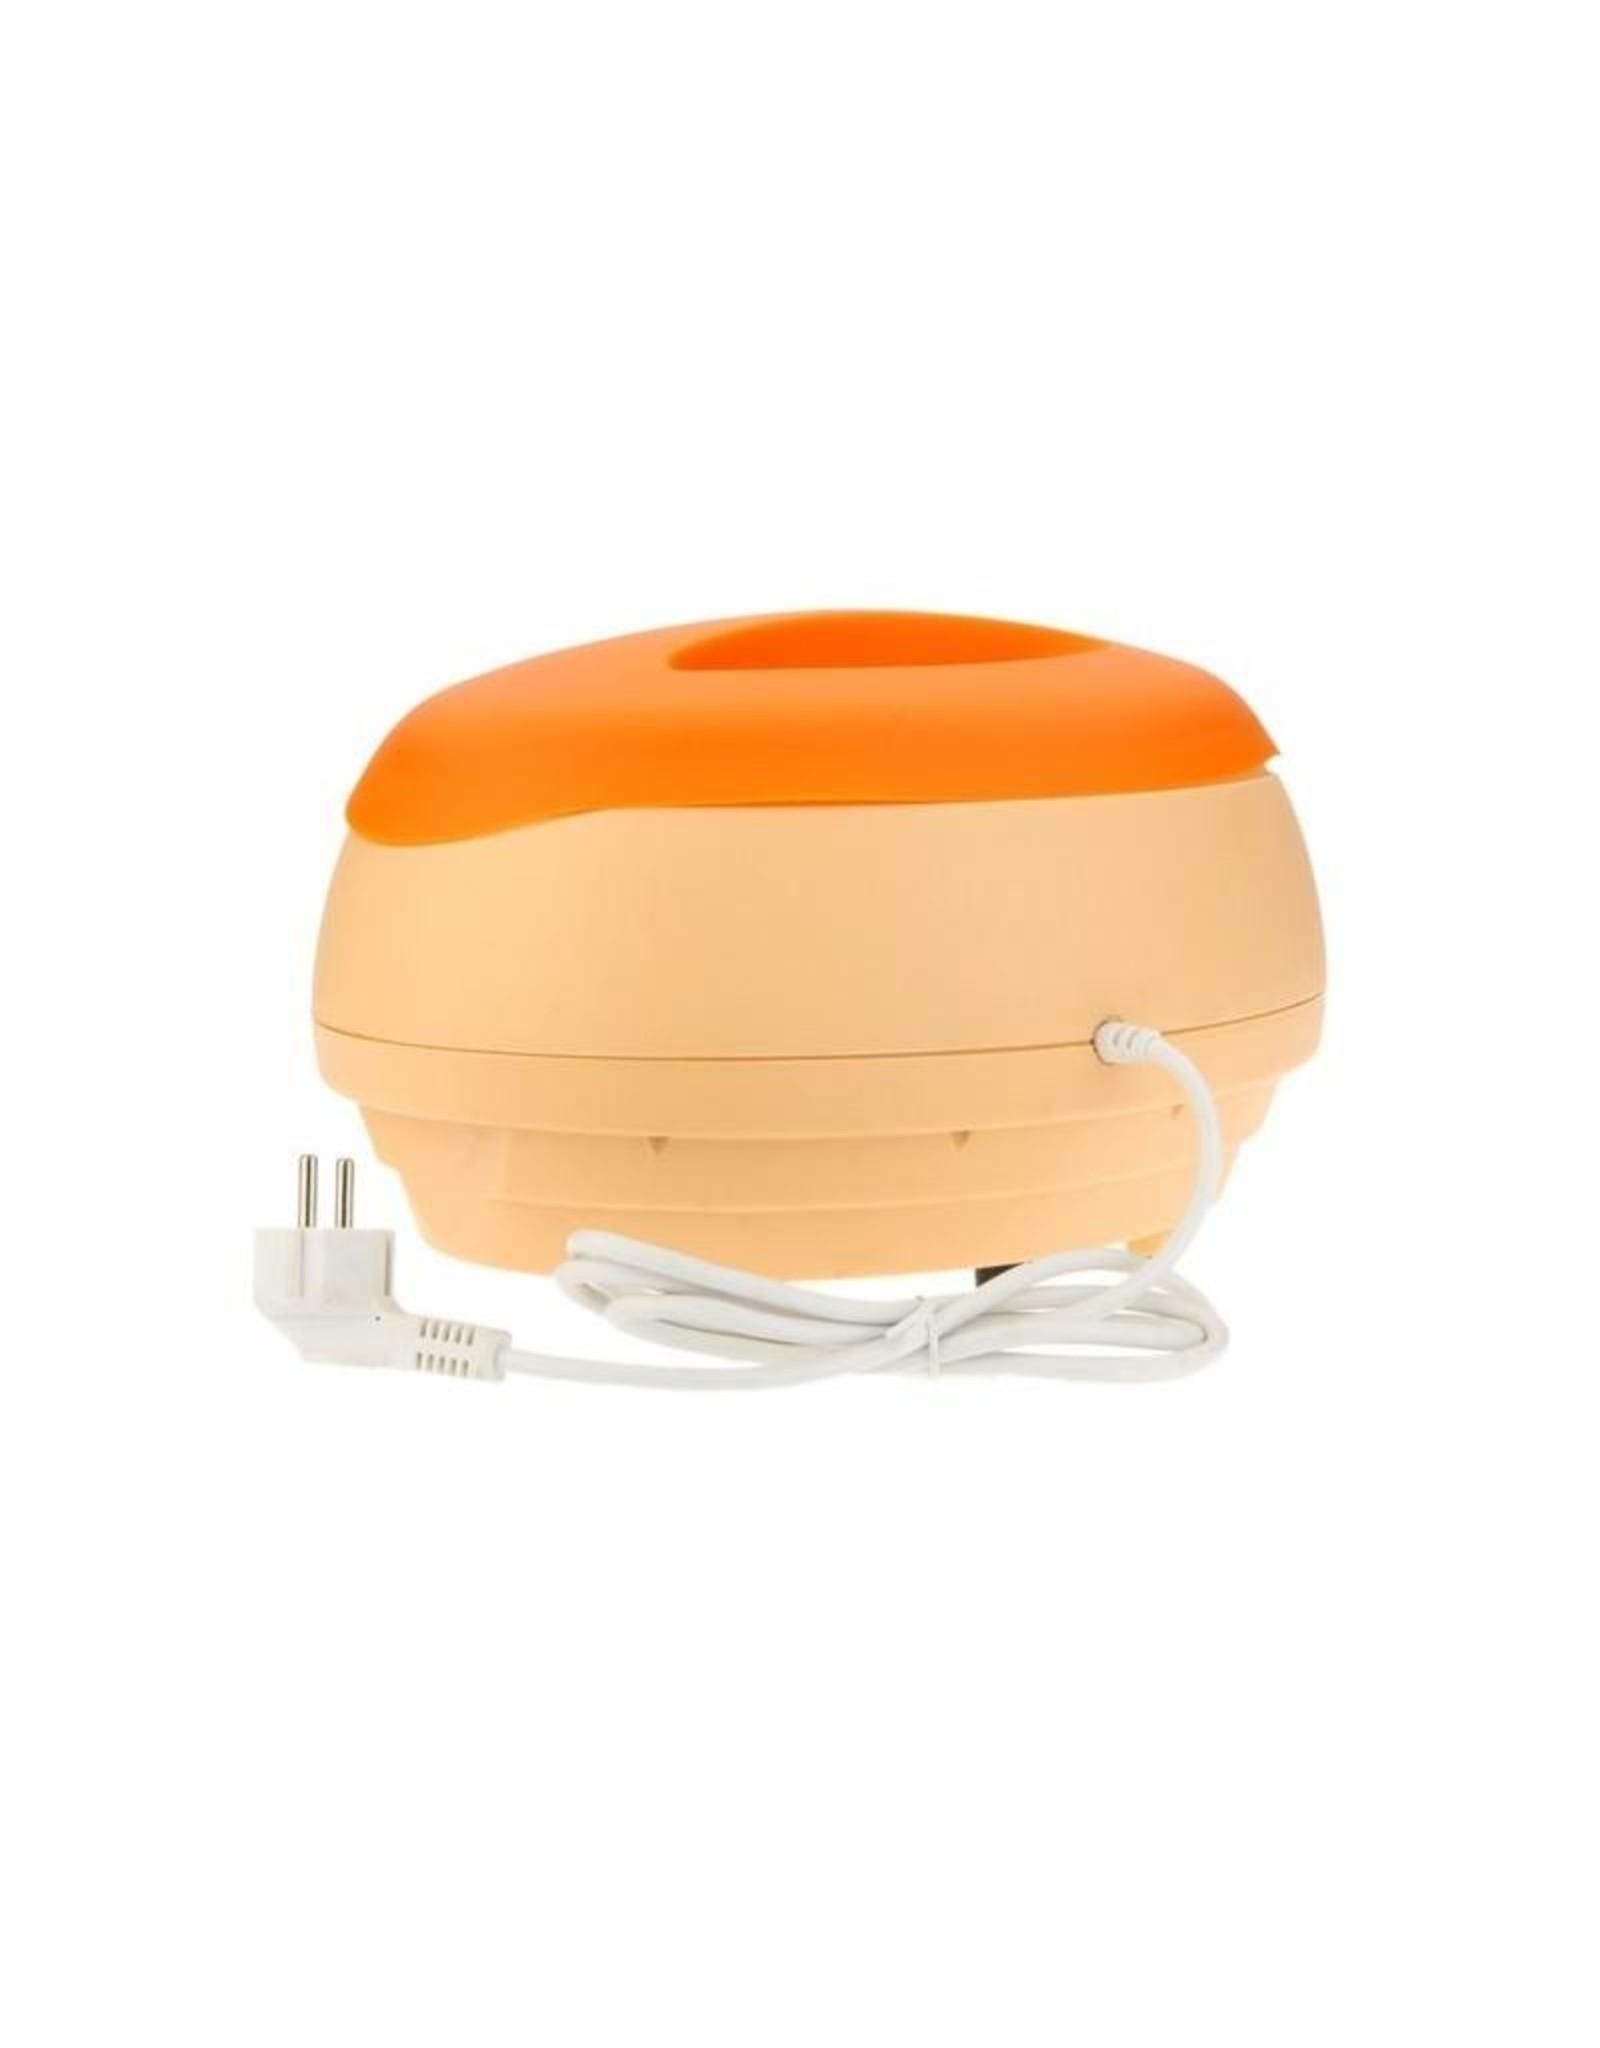 Mega Beauty Shop® Paraffinebad set standaard oranje